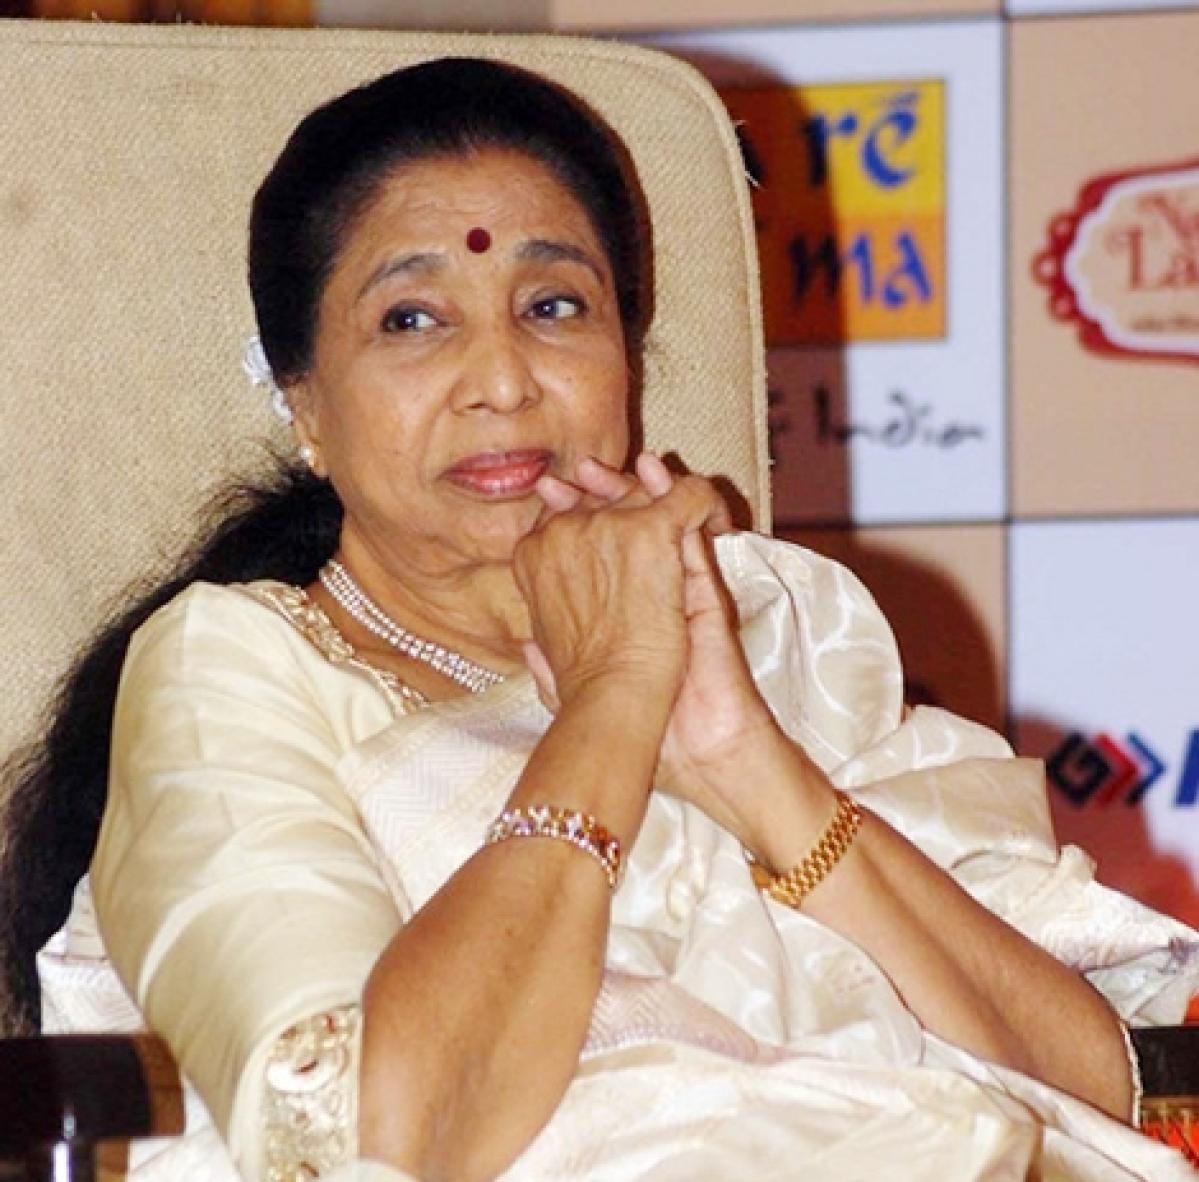 Highest civilian award of West Bengal for Asha Bhosle